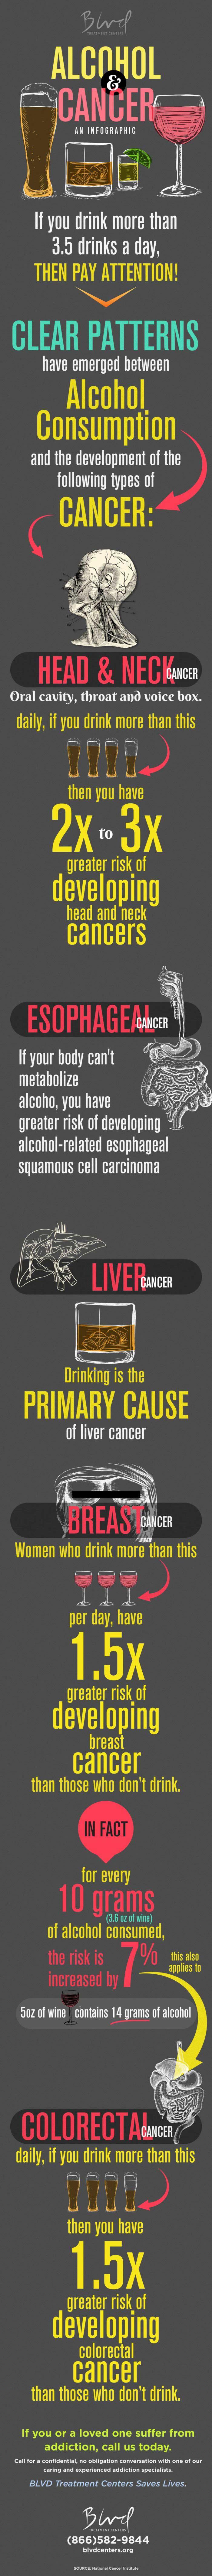 alcohol-and-cancer-infographic-e1491865432207